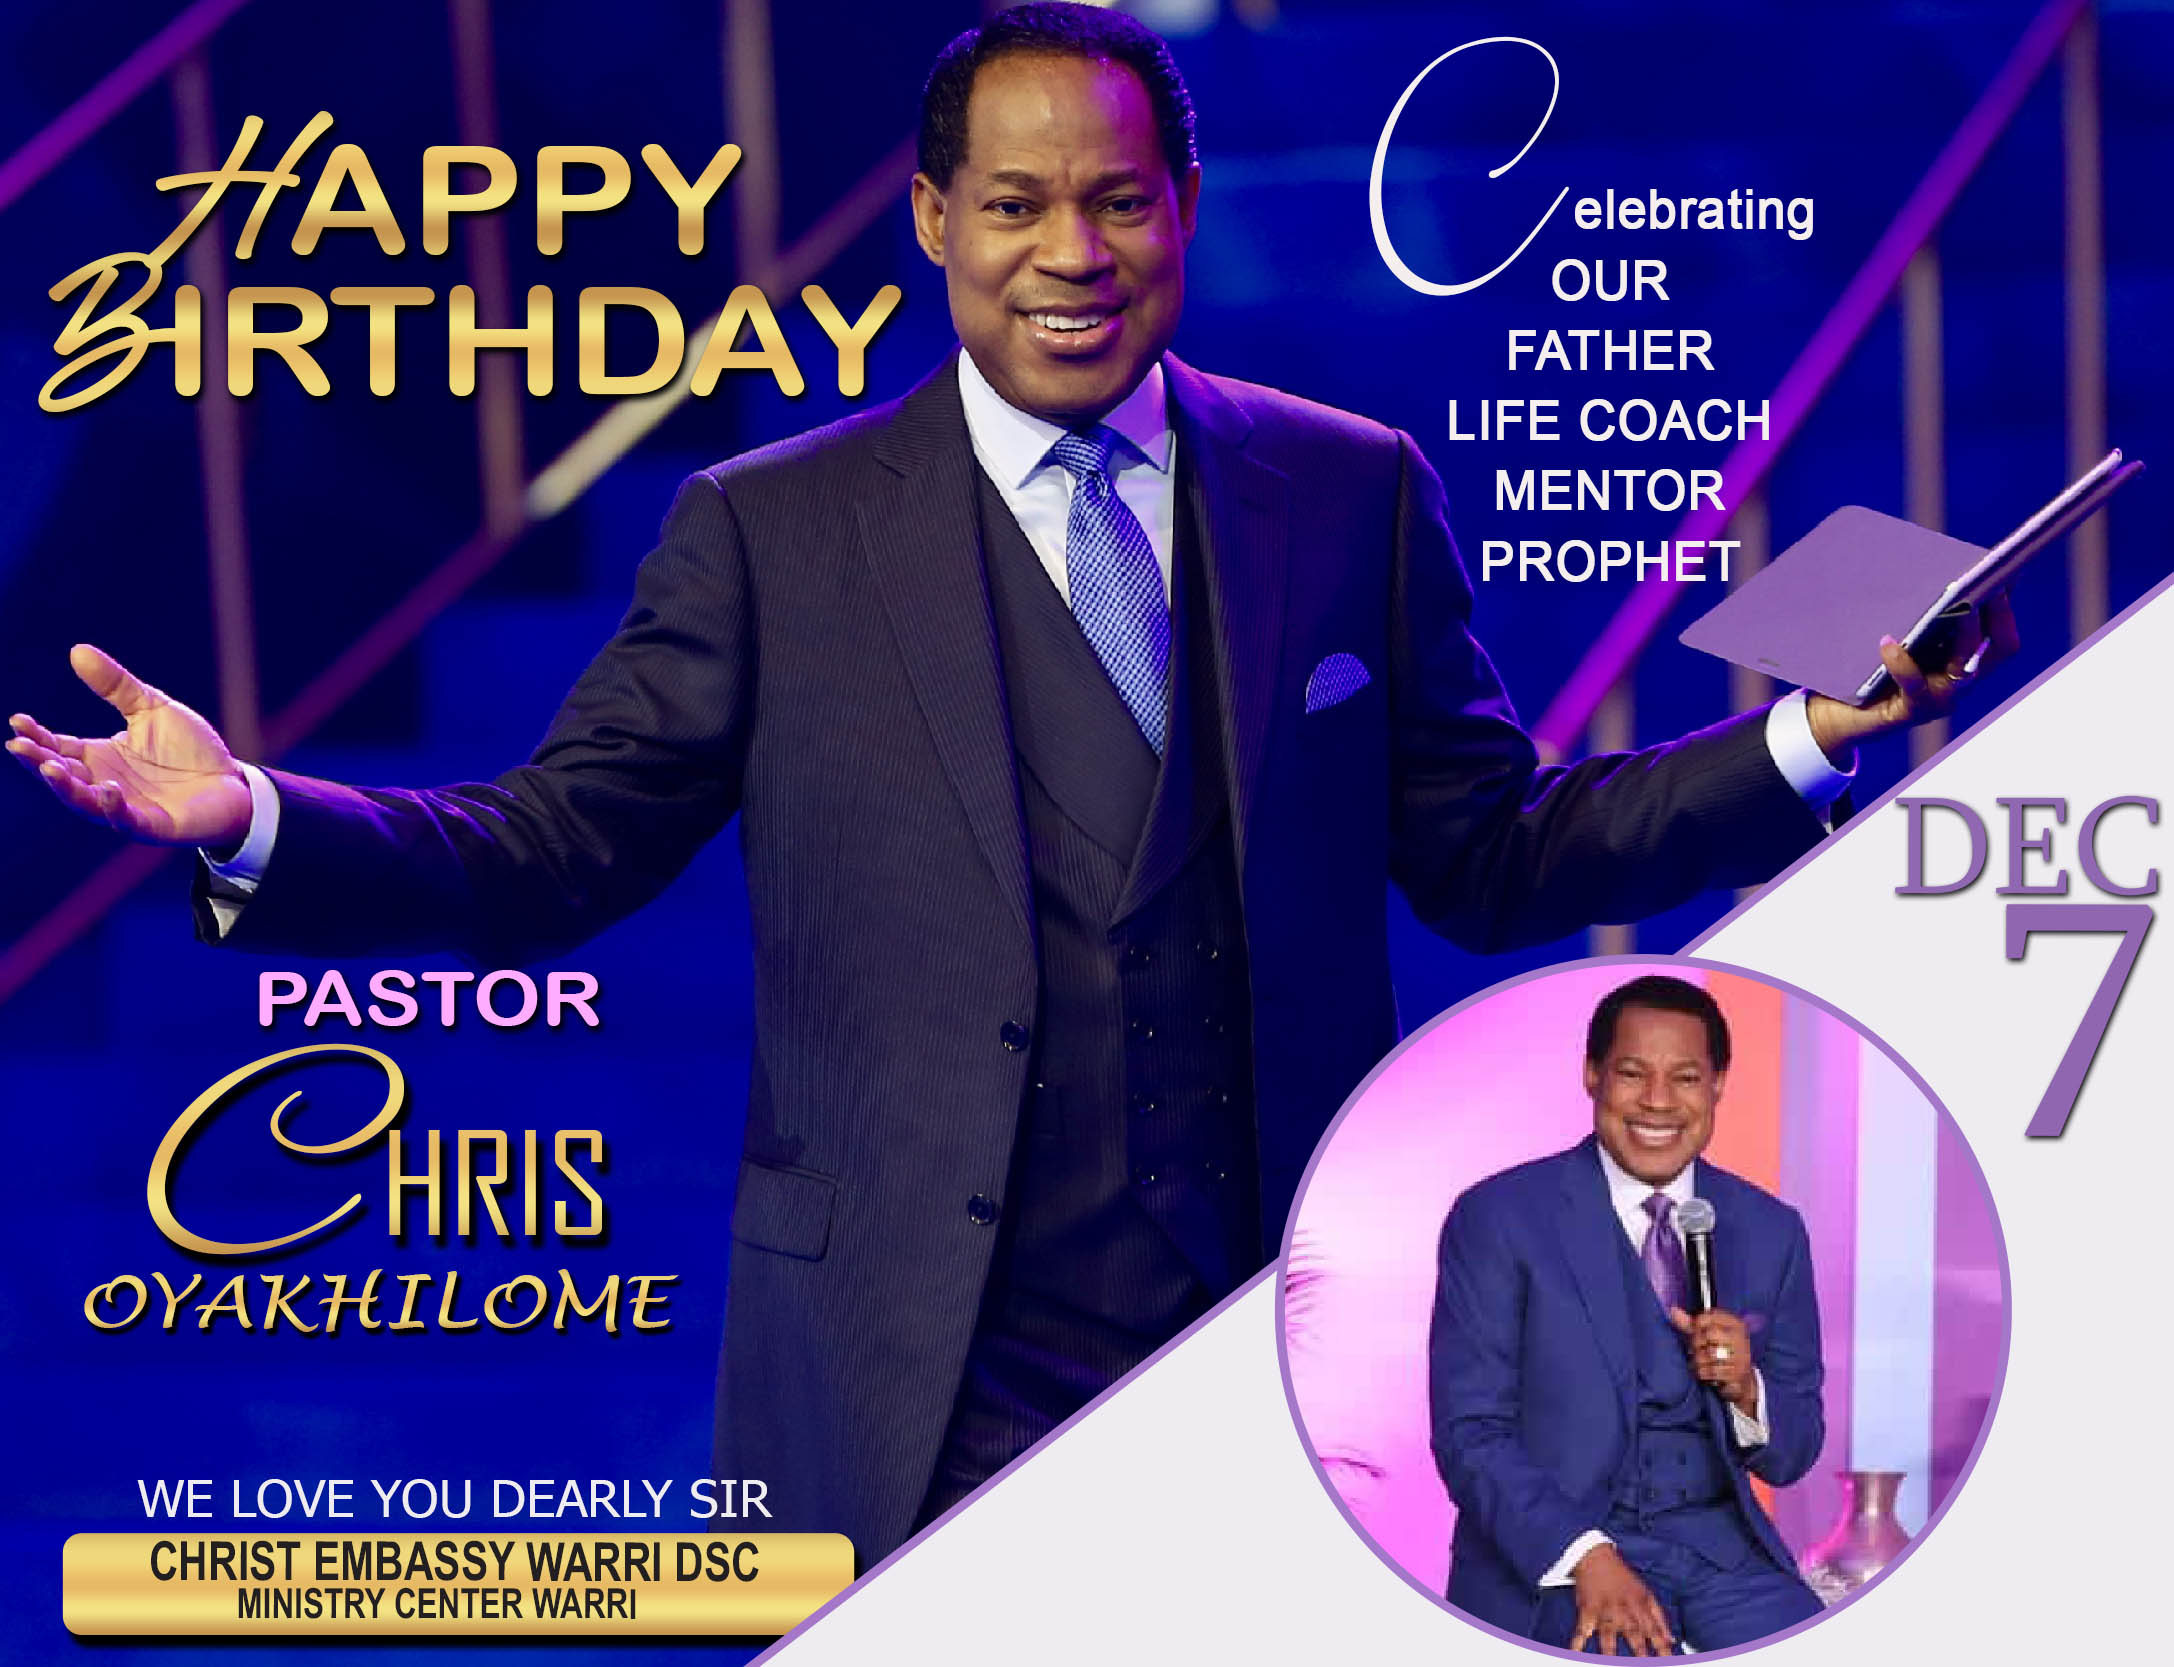 Happy Birthday Daddy #offer7 #dec7